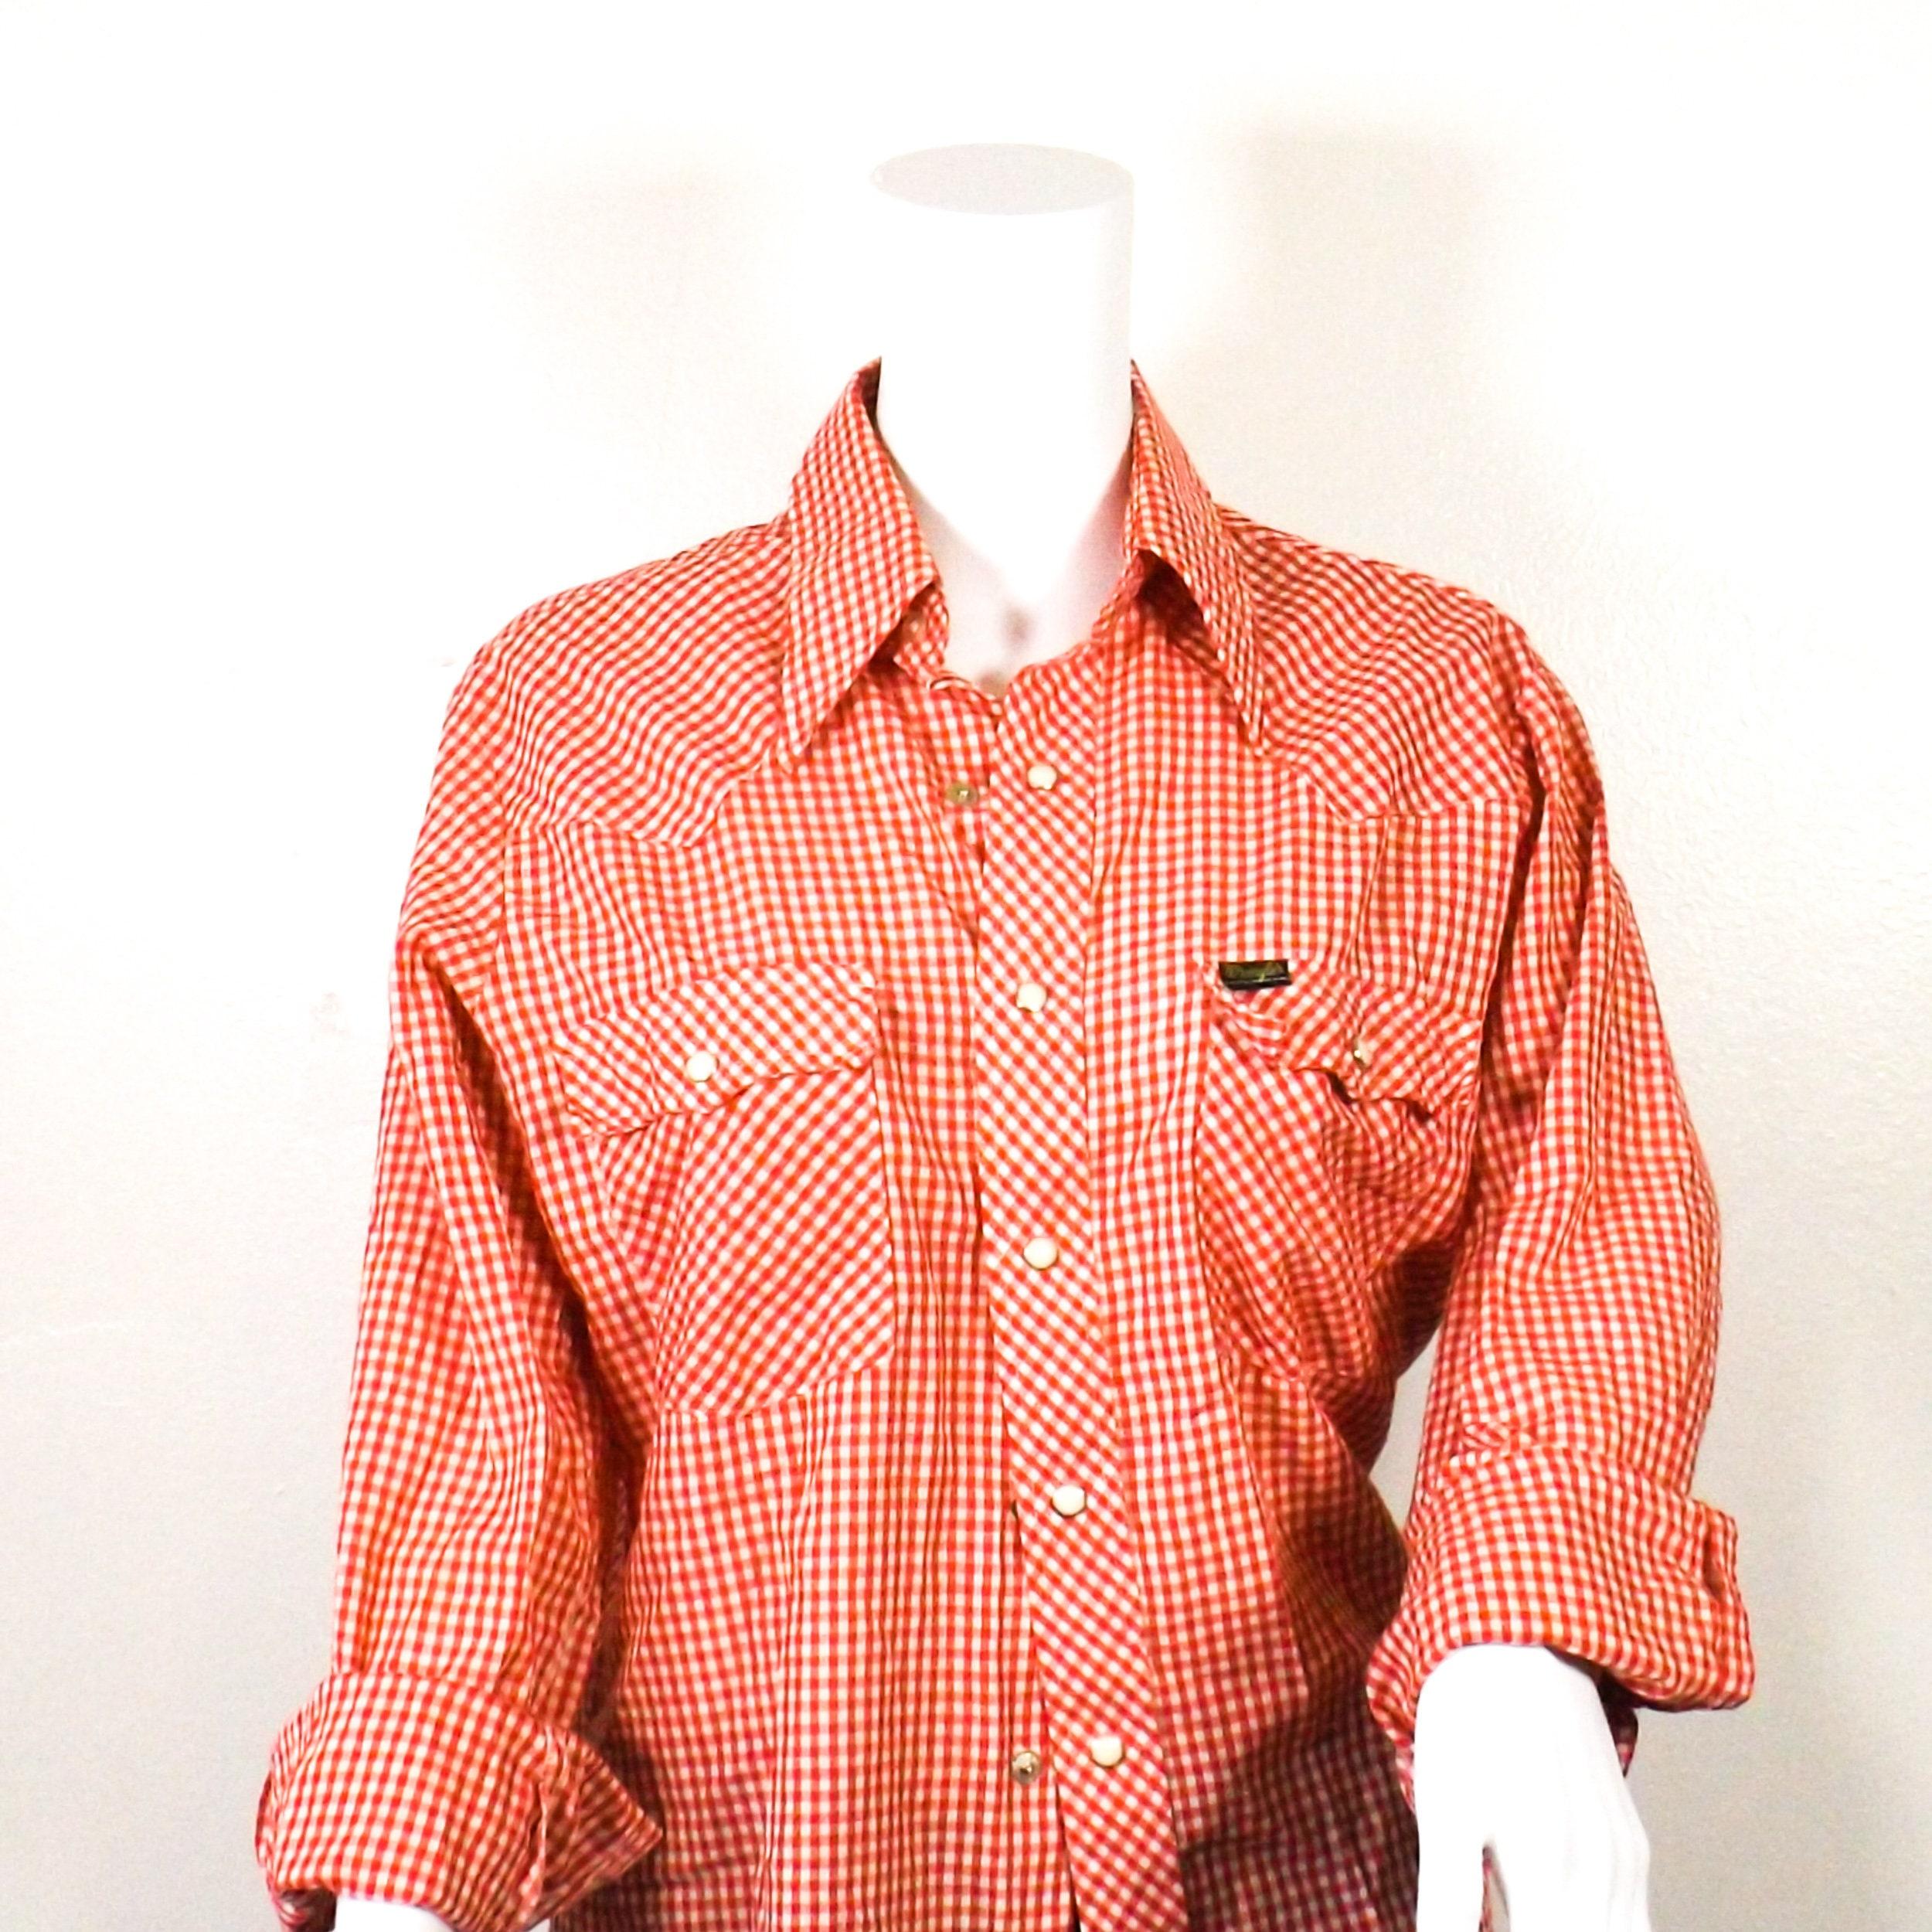 1970s Men's Shirt Styles – Vintage 70s Shirts for Guys Red White Checkered Wrangler Button Down Shirt Mens Medium Vintage 70S $20.00 AT vintagedancer.com